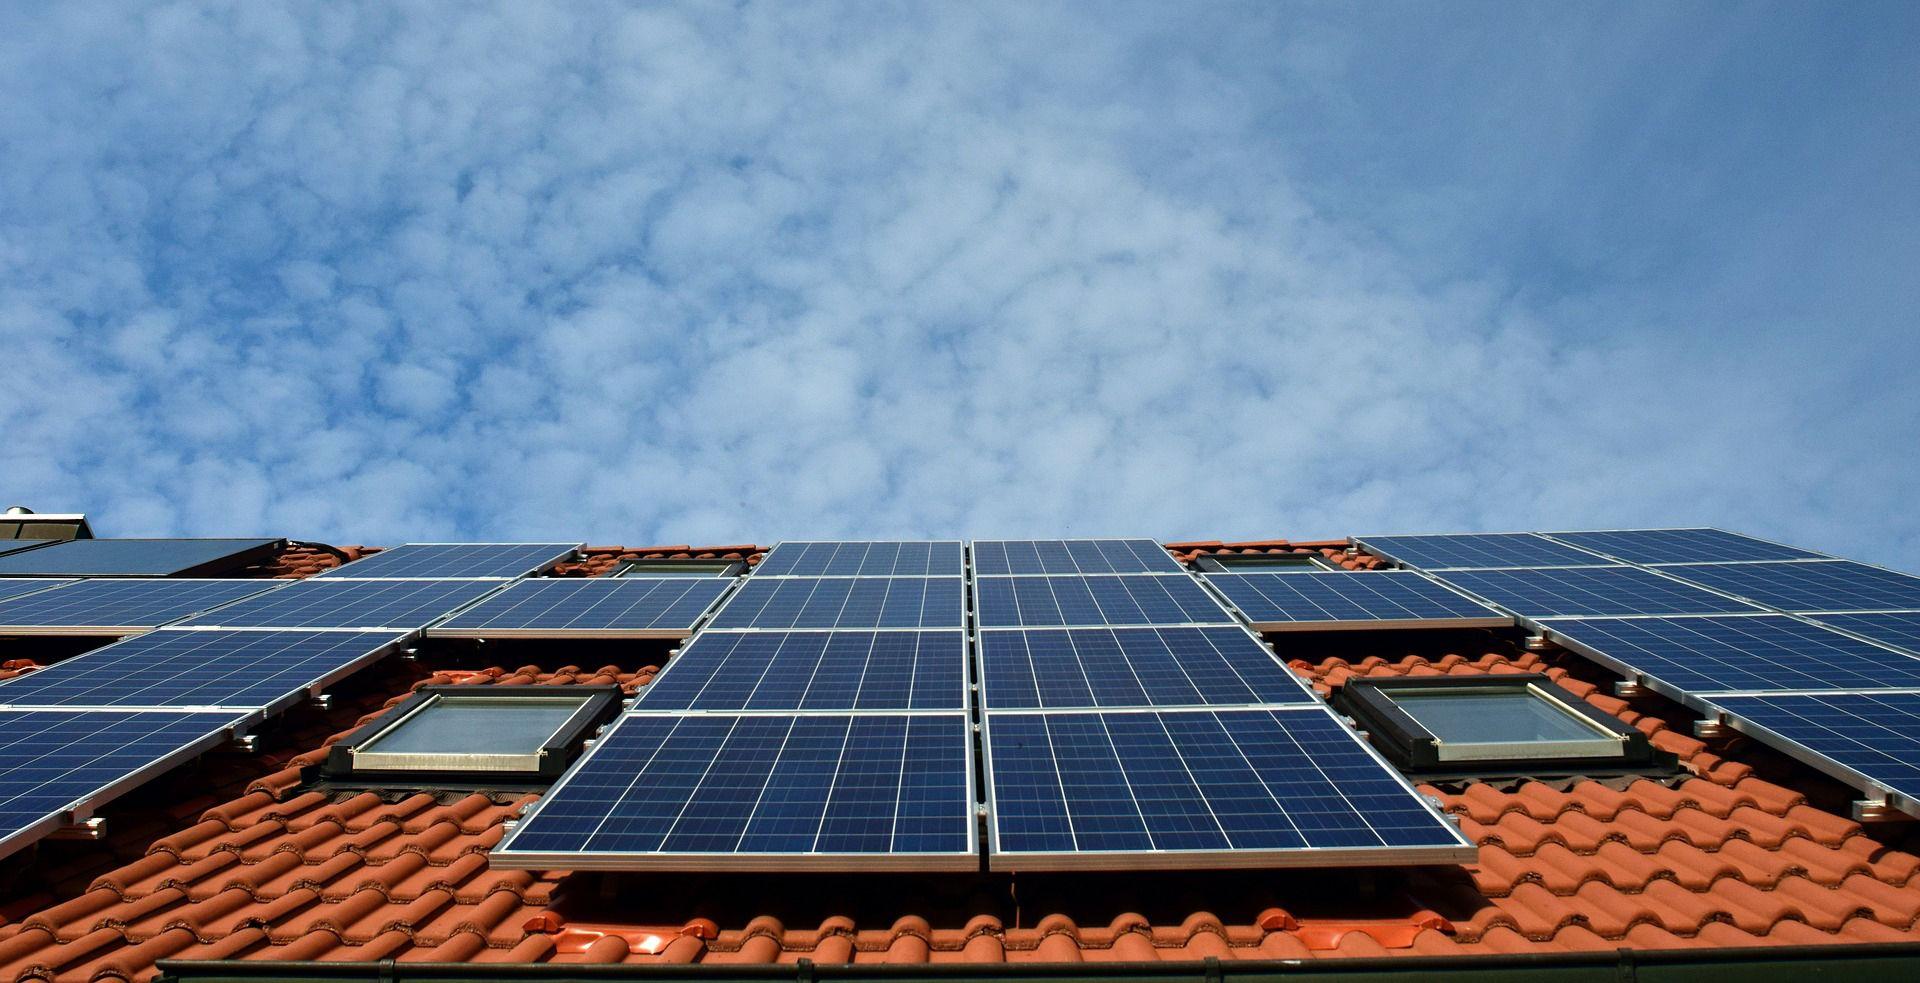 Eco Remodeling At Precision Home Design Remodeling Homeremodeling Kitchenremodeling Bathroomremodeling Solar Energy Panels Solar Panels Best Solar Panels